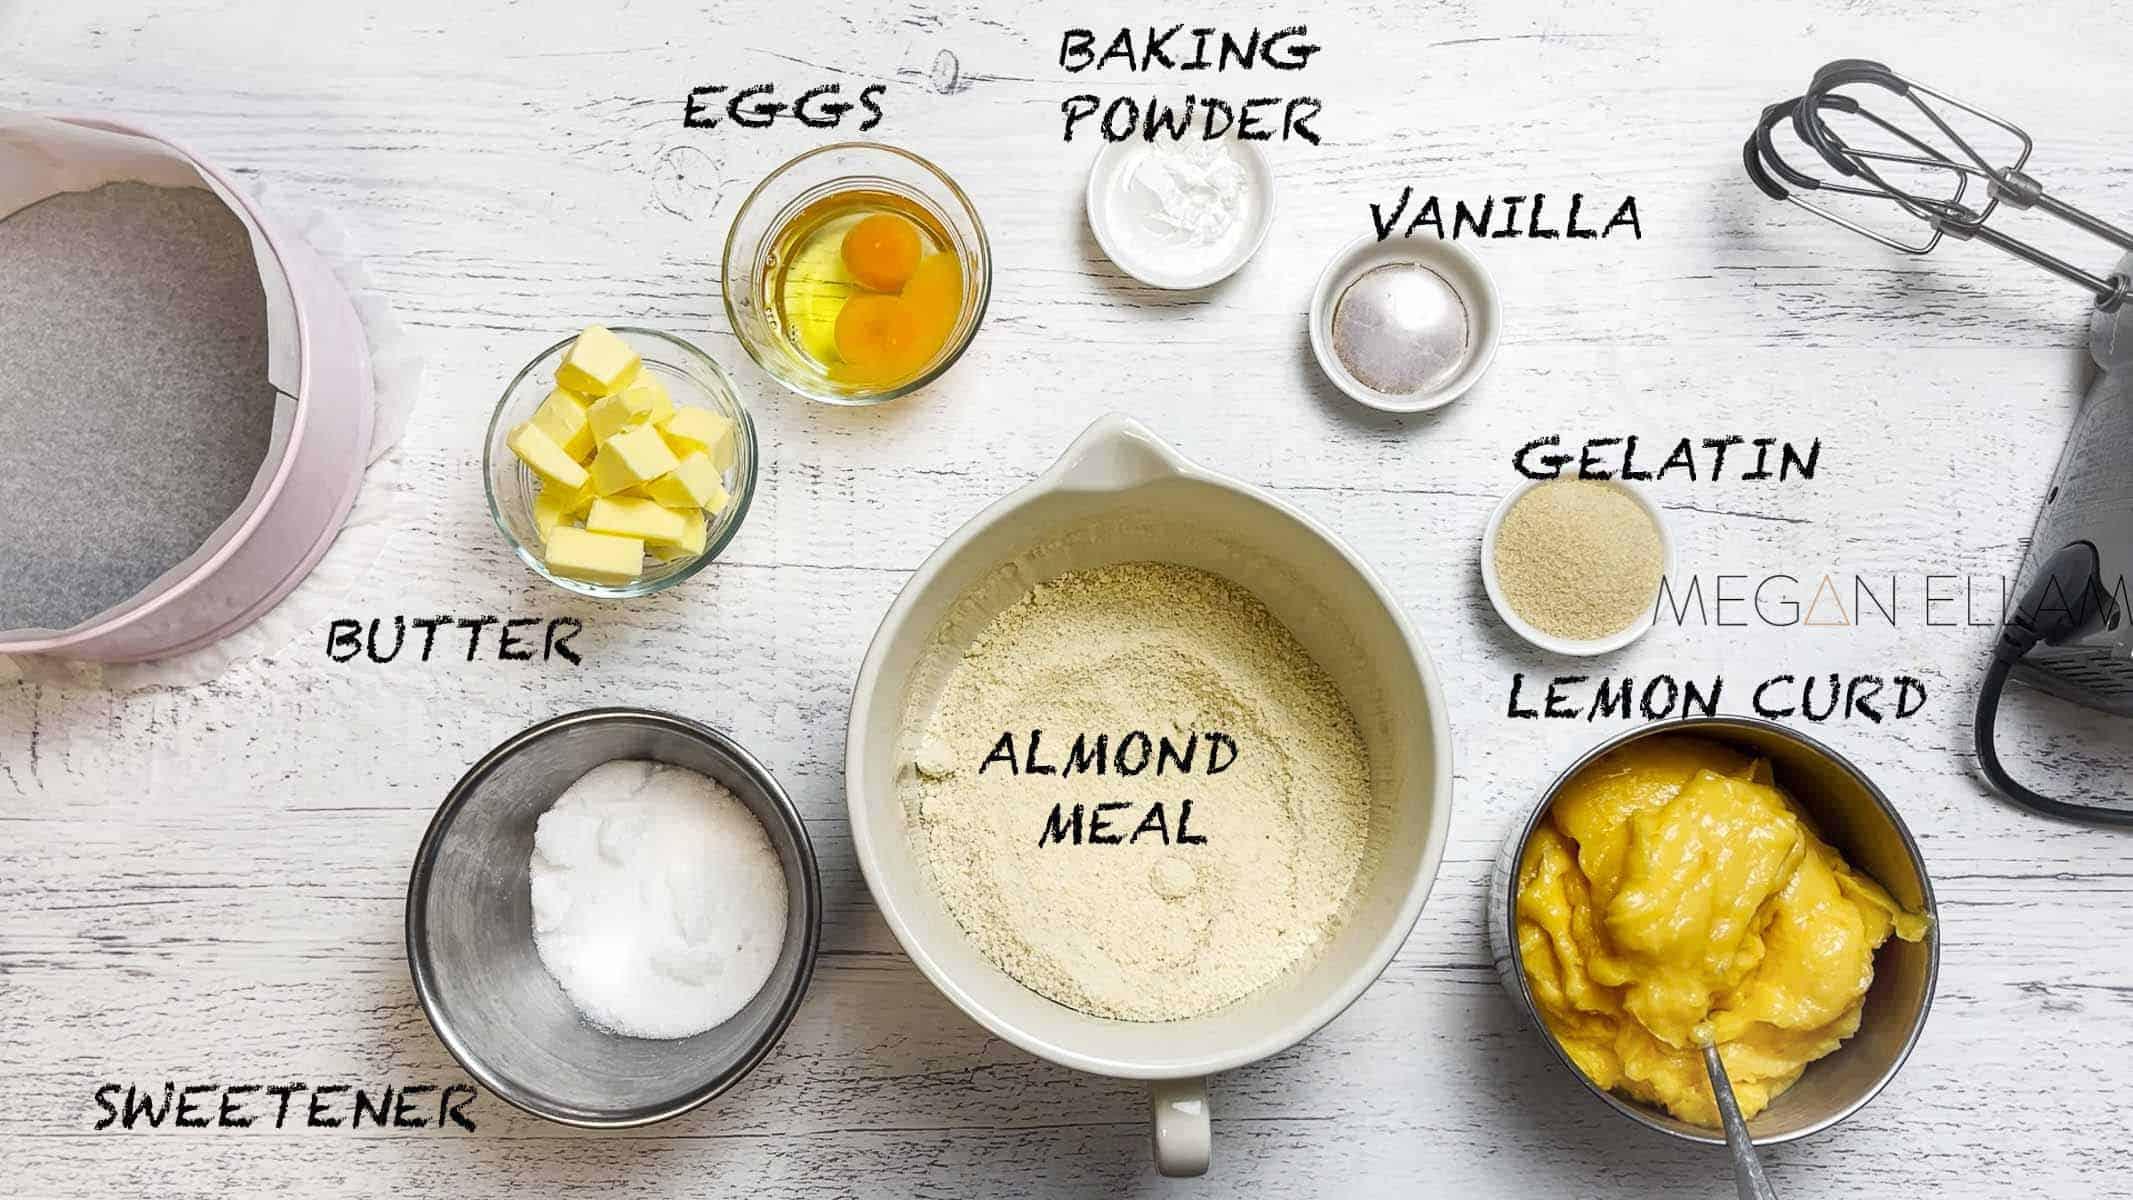 Lemon cake ingredients in small bowls